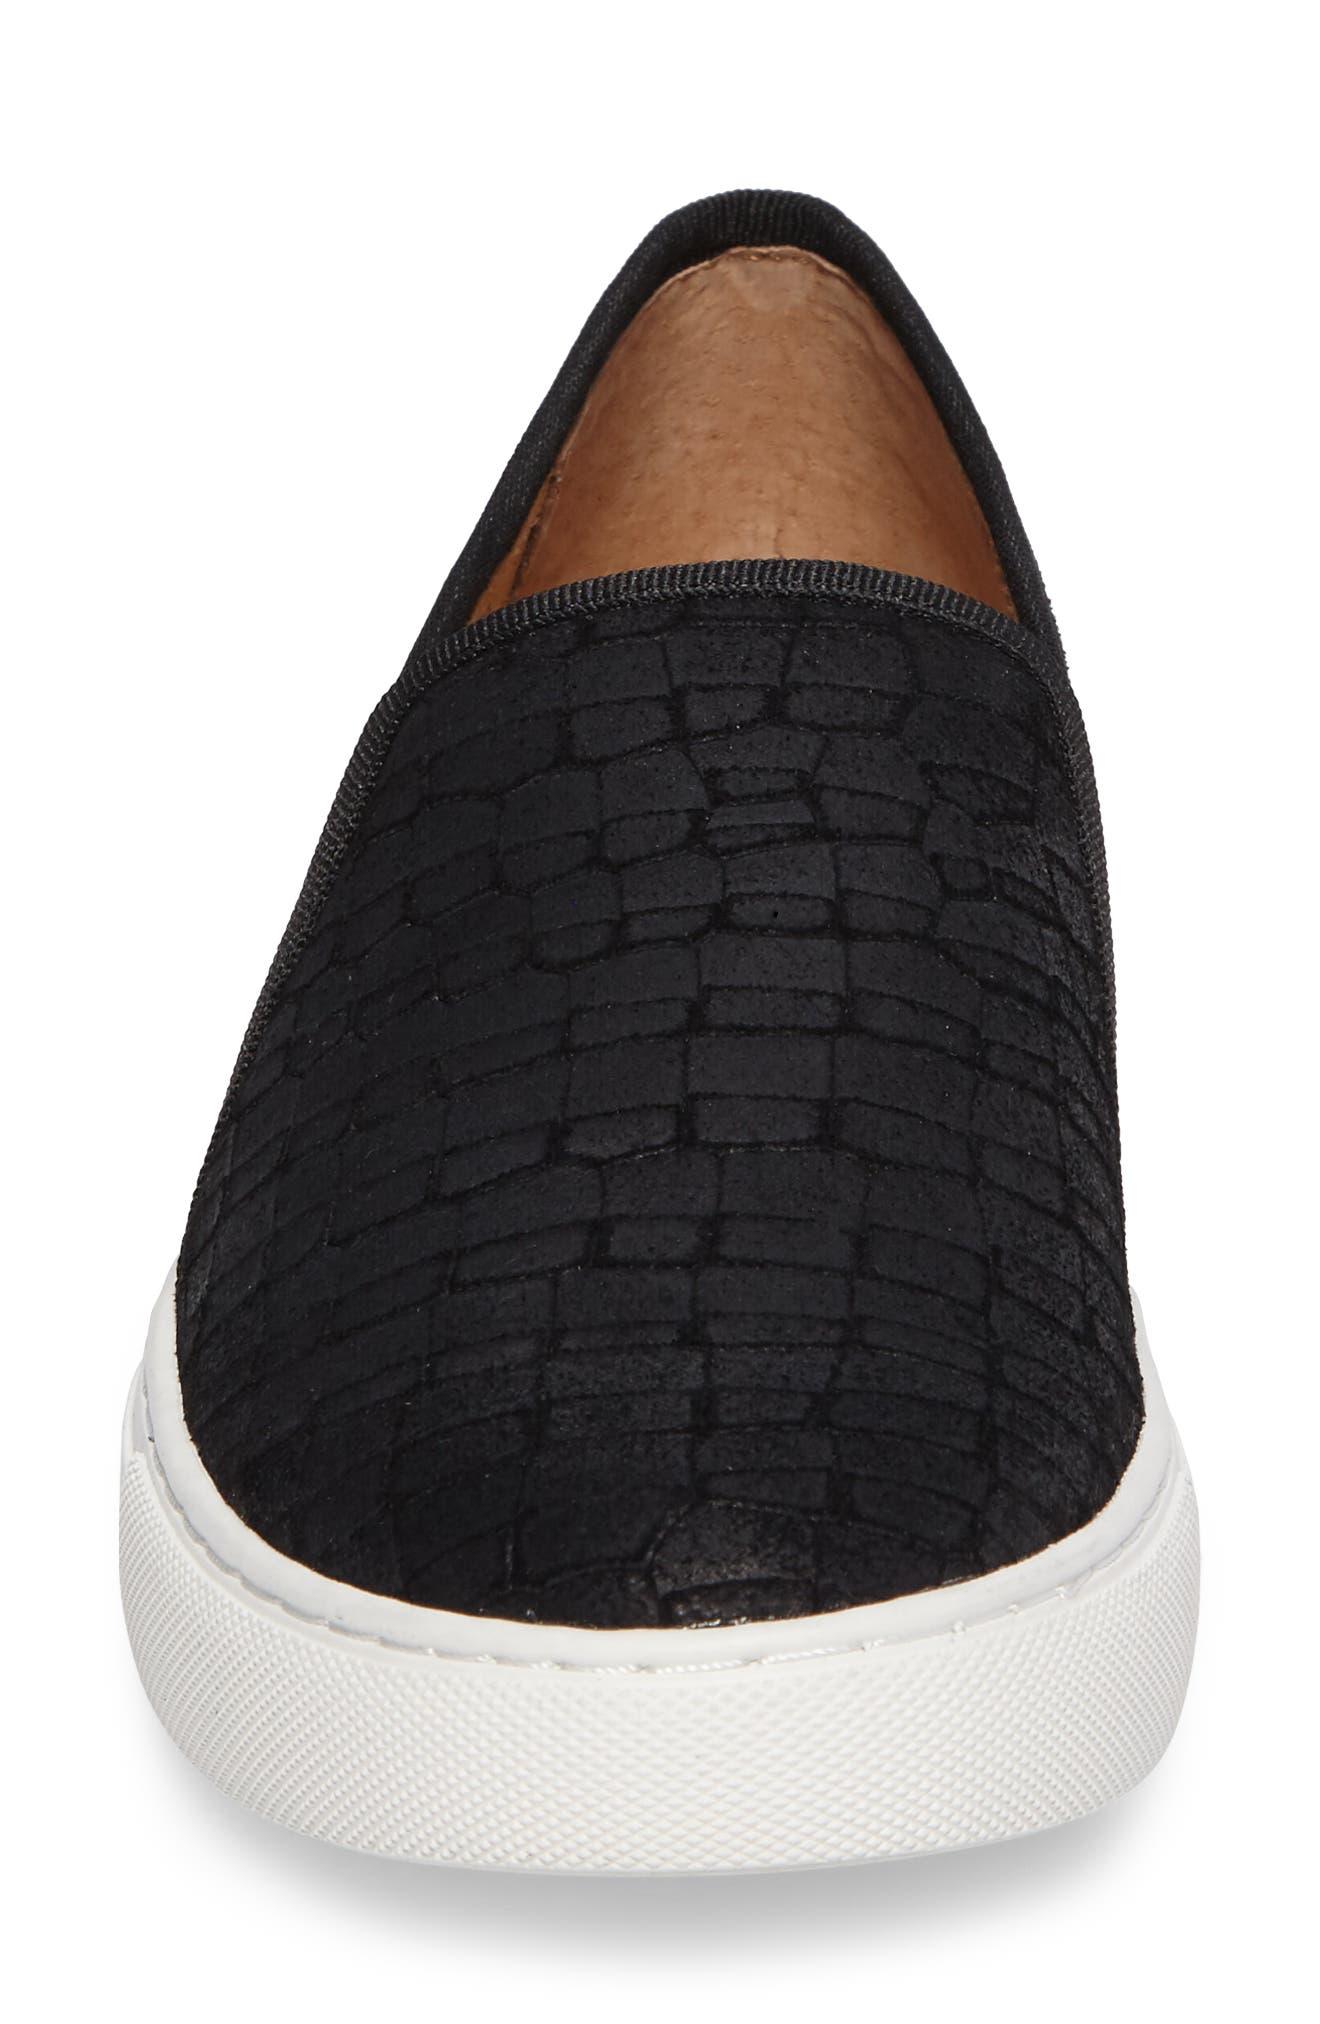 CC Corso Como Skipper Slip-On Sneaker,                             Alternate thumbnail 4, color,                             002